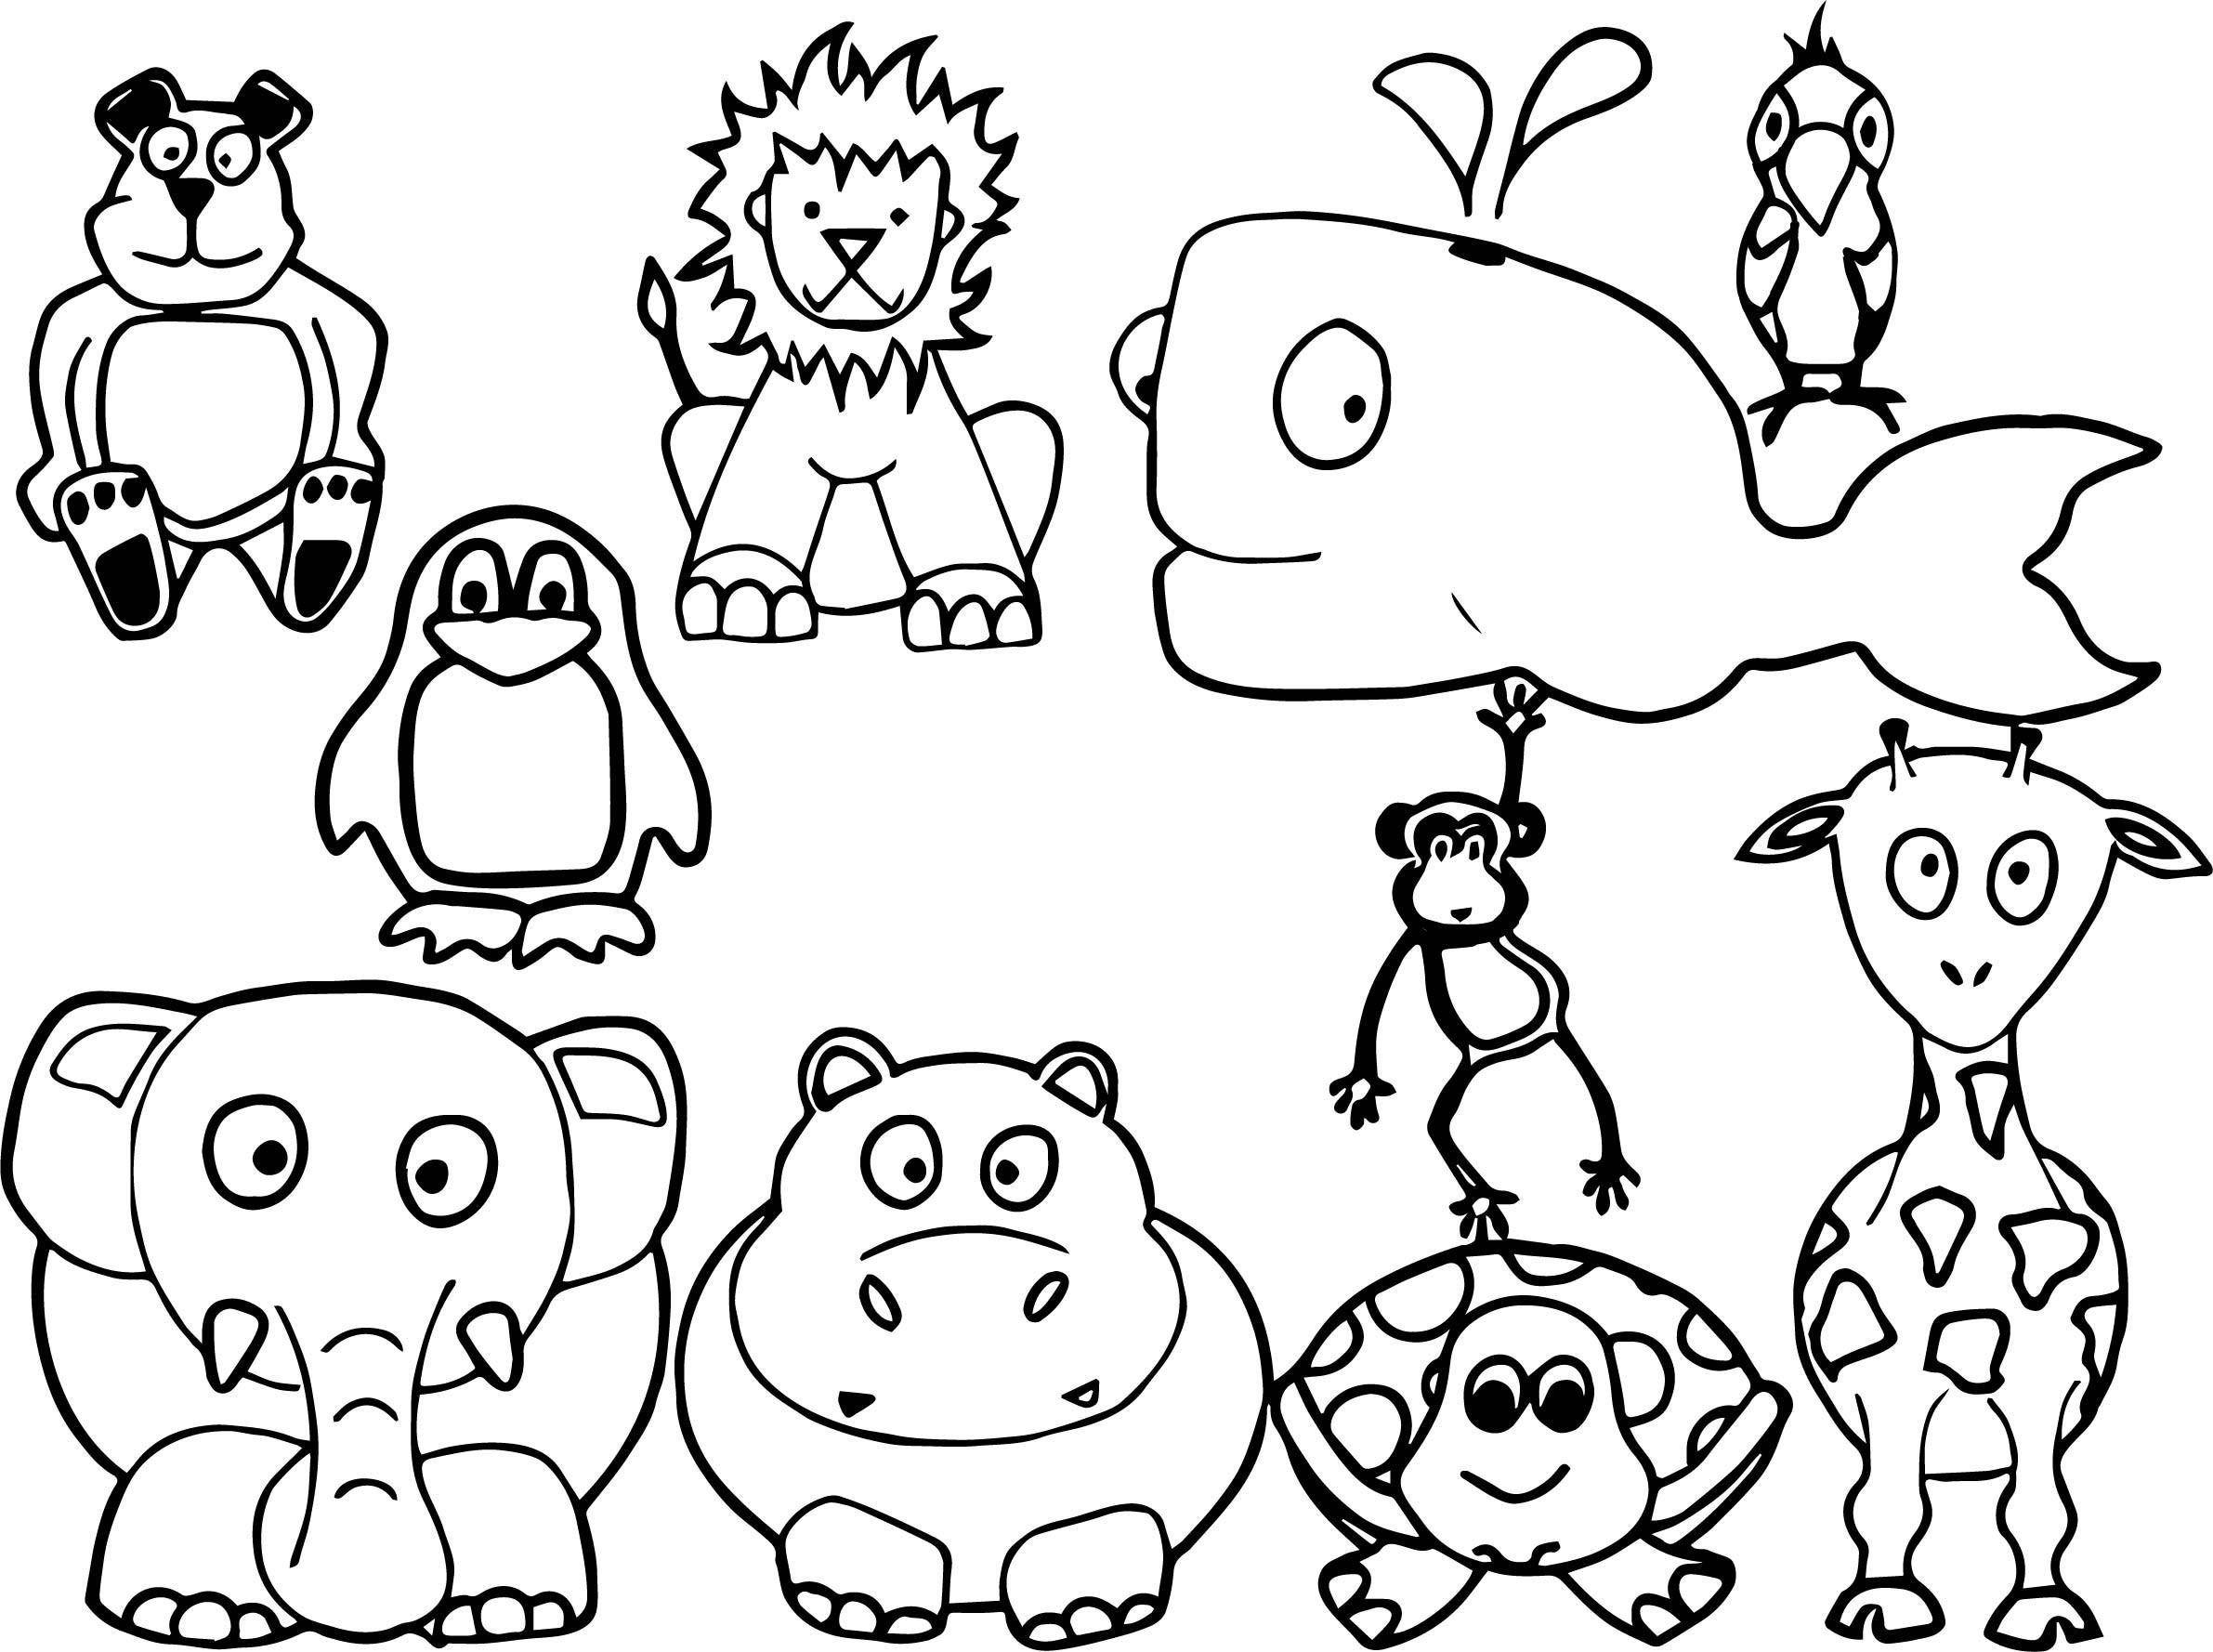 colouring sheets animals 30 free printable geometric animal coloring pages the sheets animals colouring